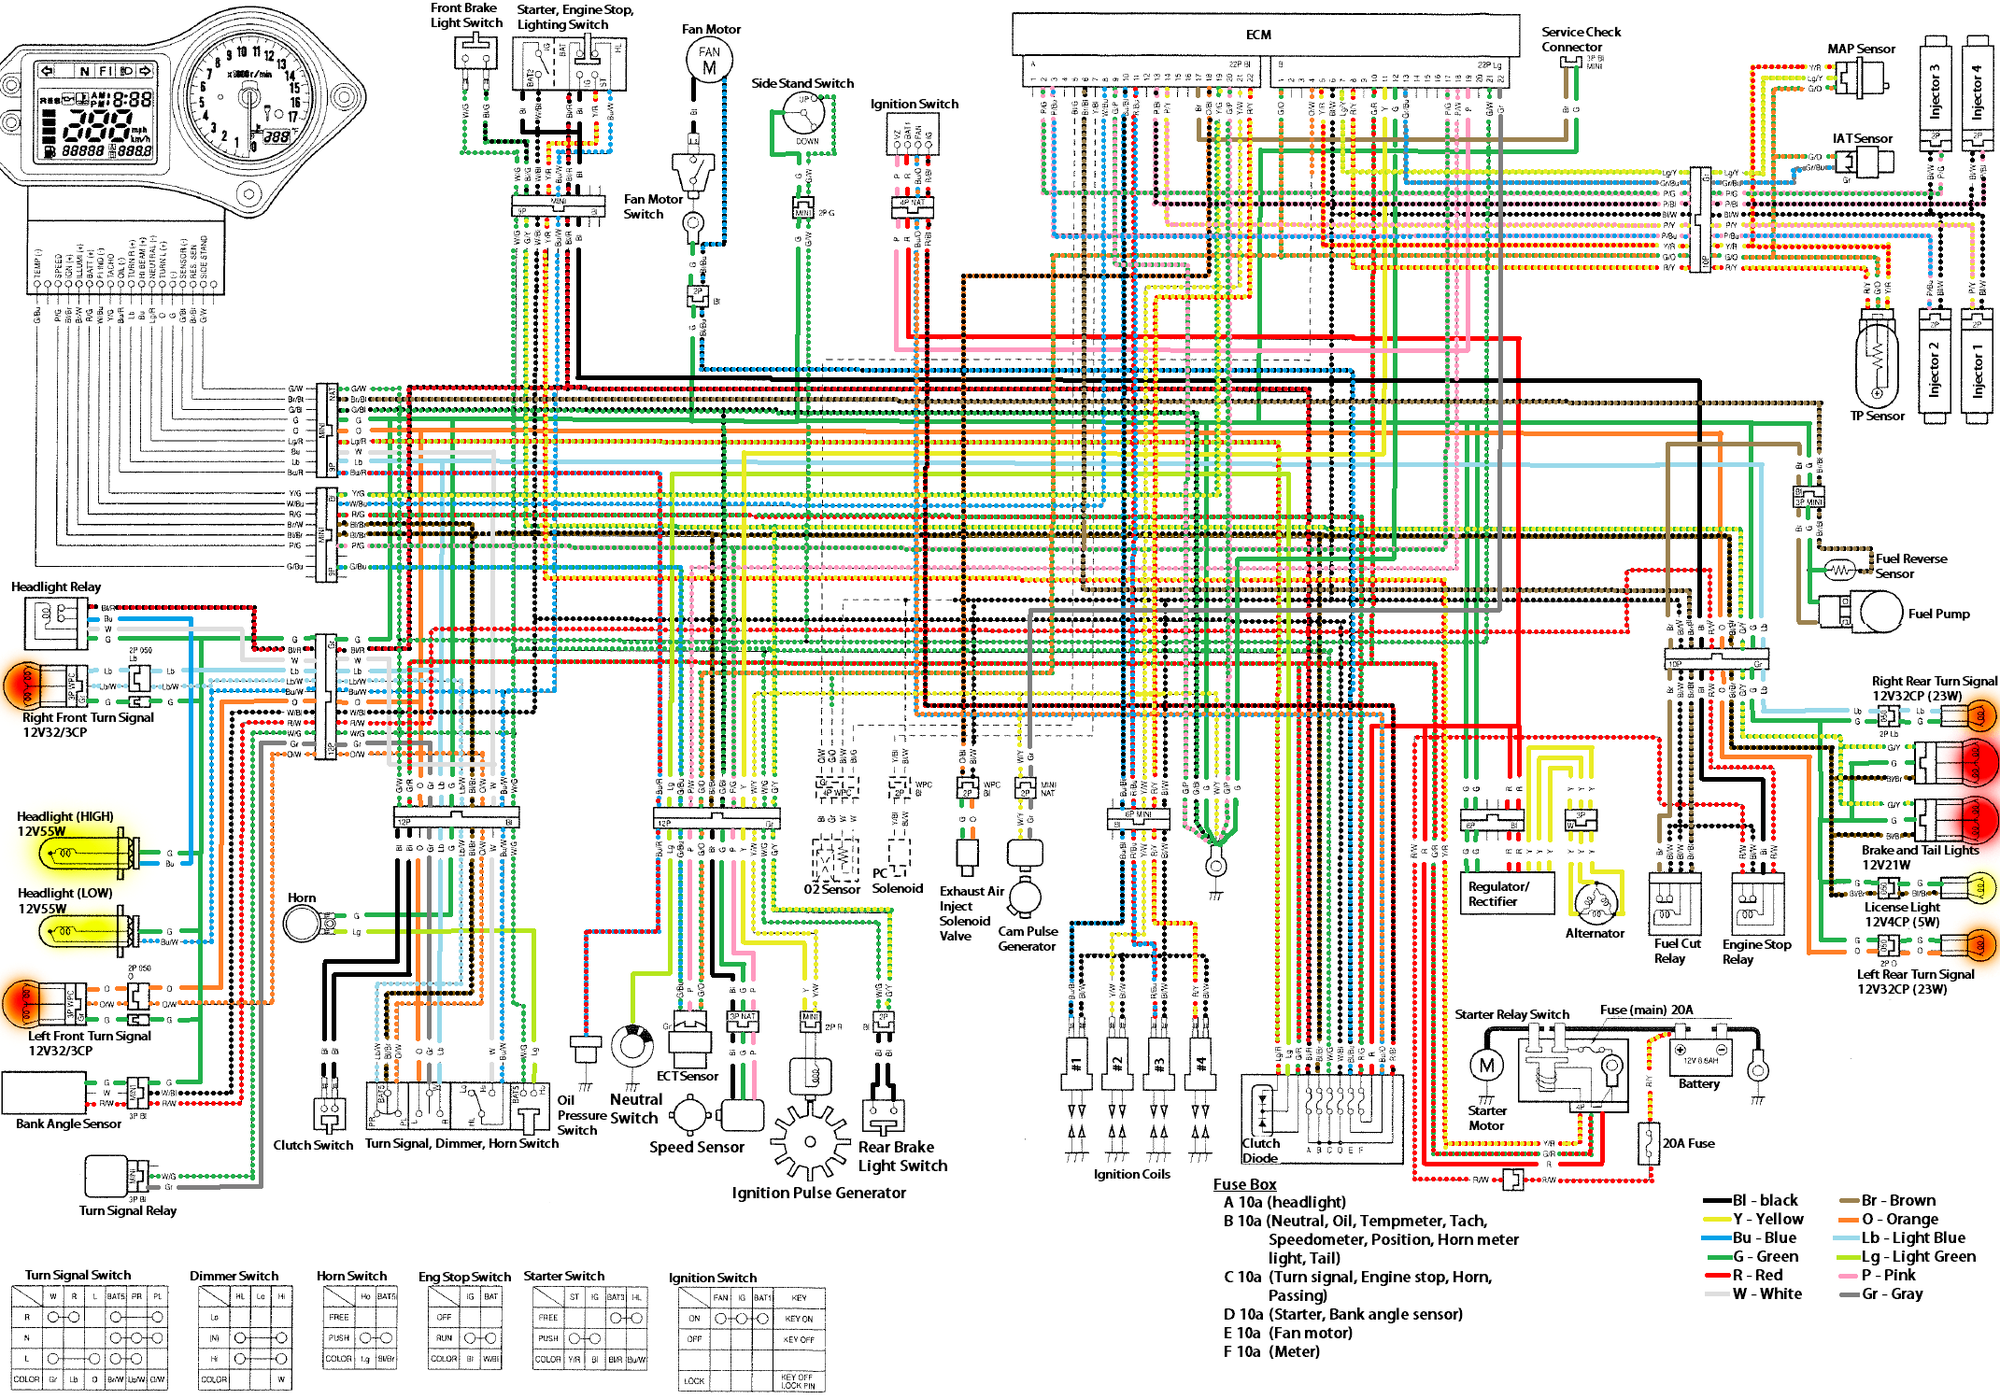 Cbr929rr Wiring Diagram - Wiring Diagram •wiring diagram